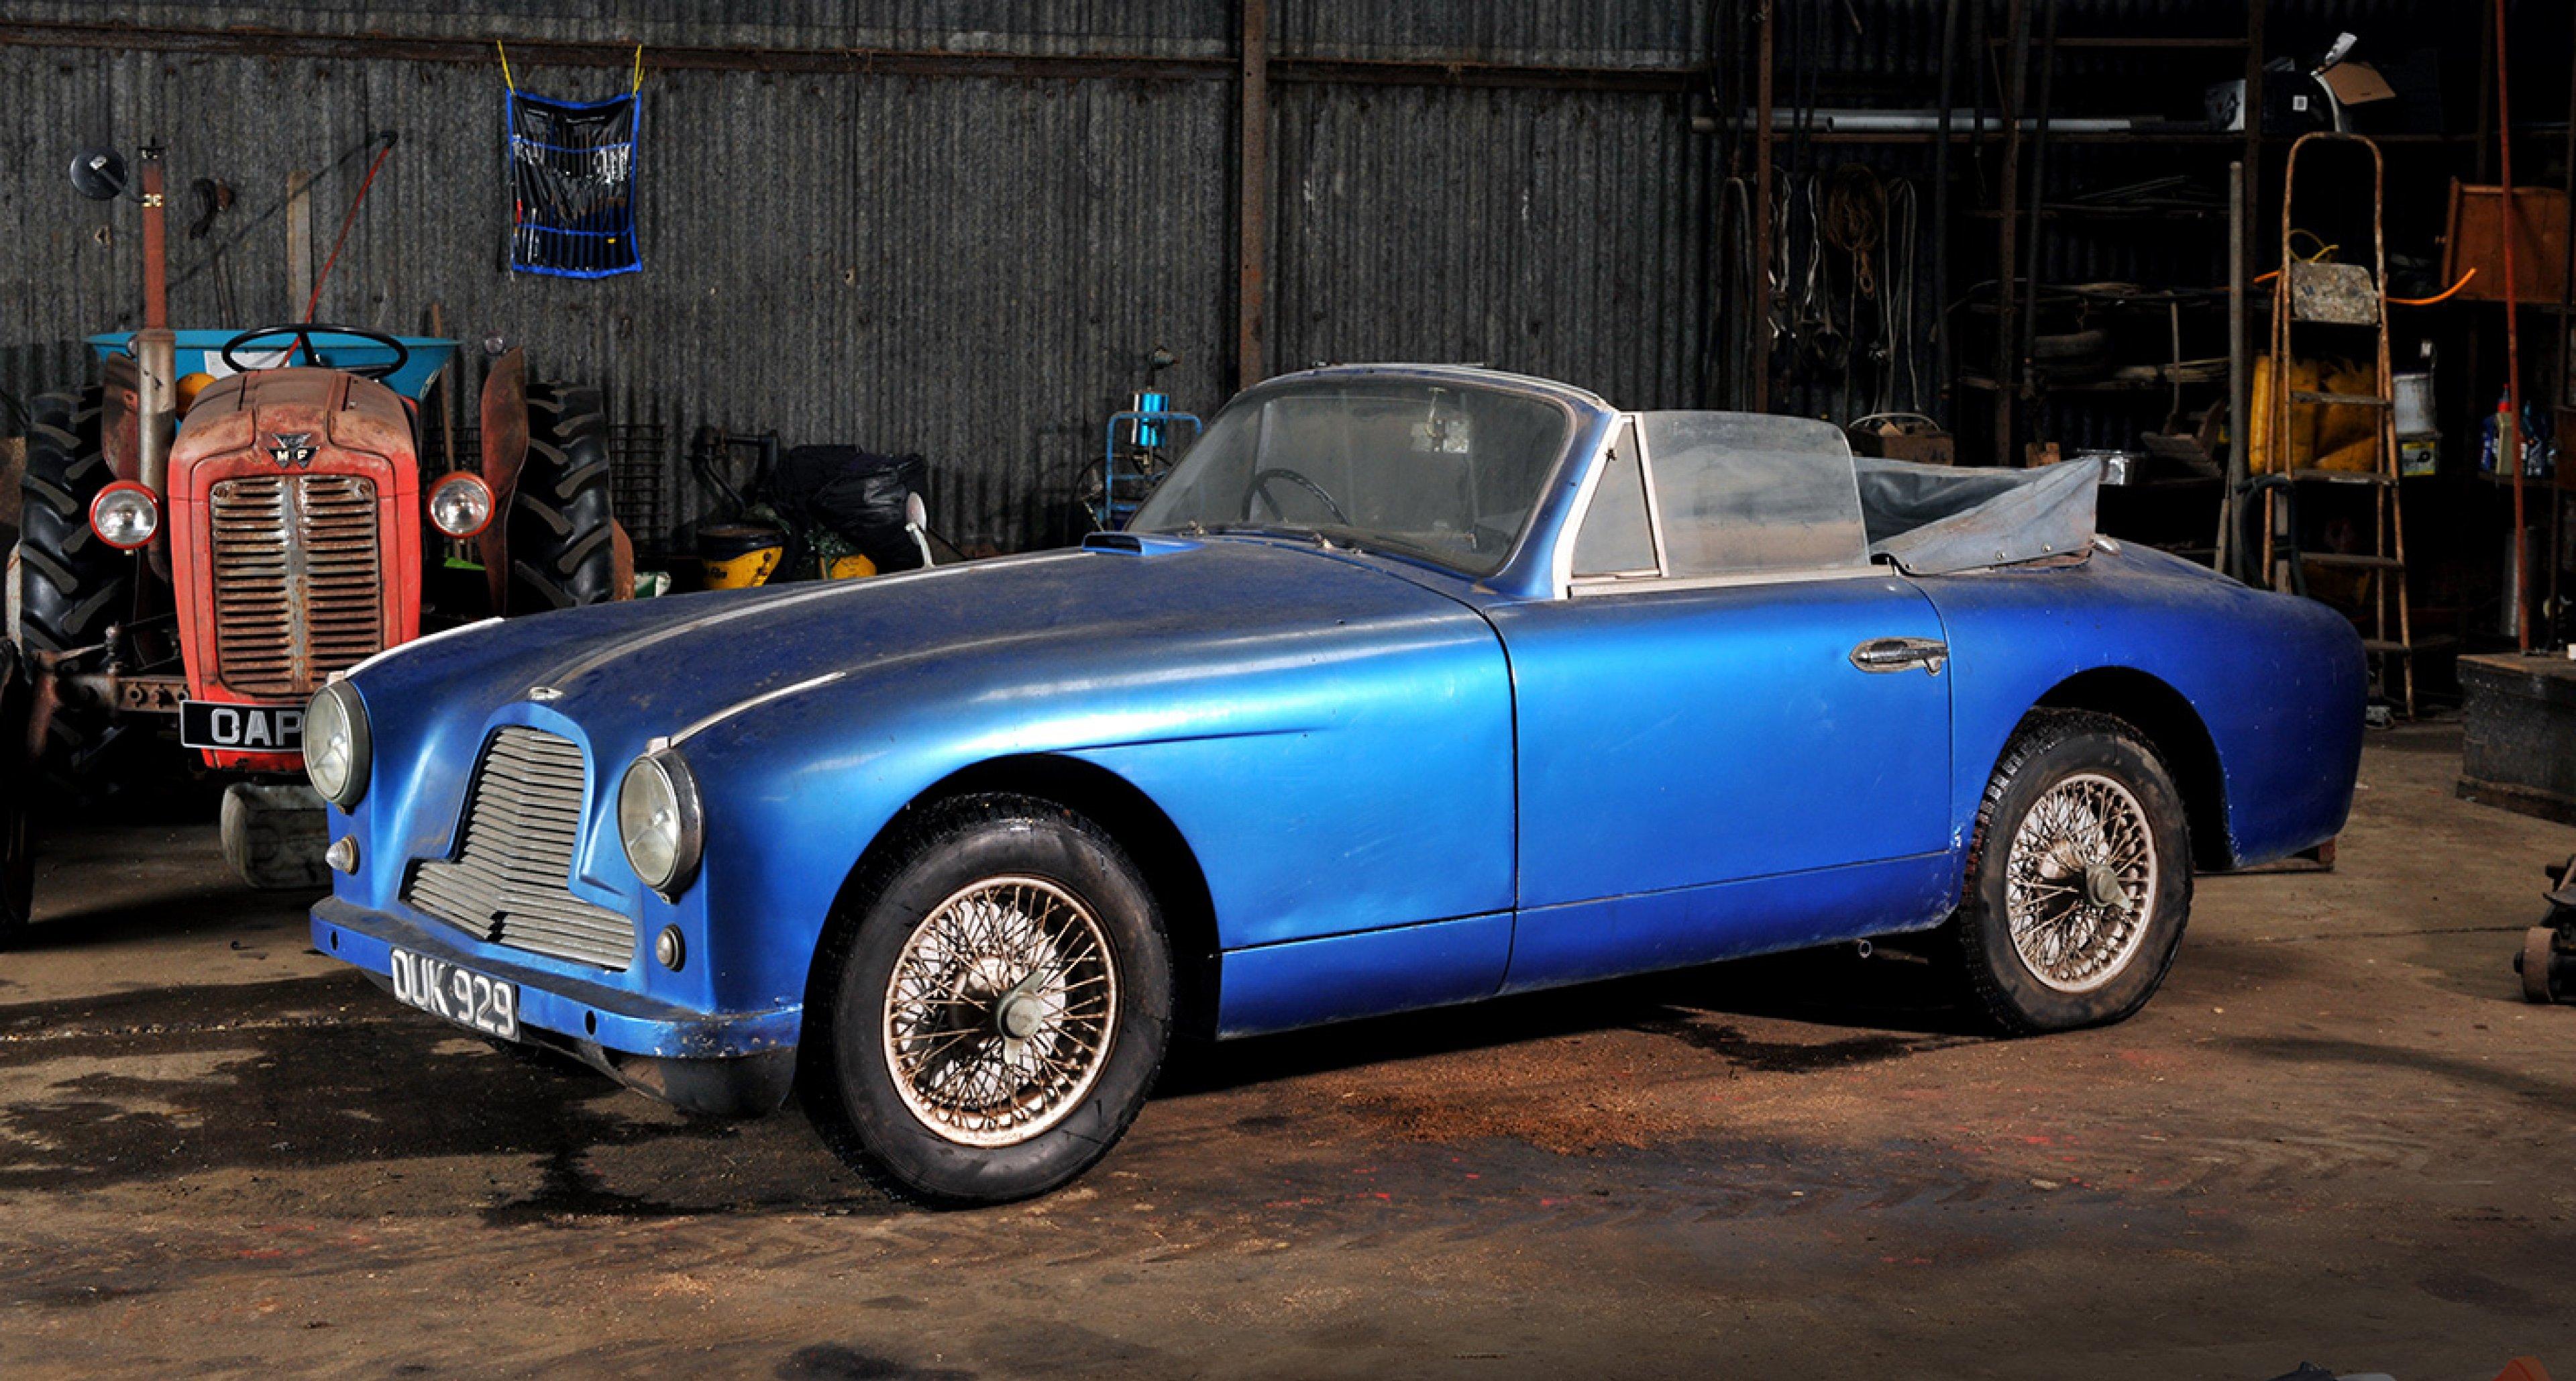 Aston Martin DB2/4 DHC, sold by Bonhams in 2012 for £113,500